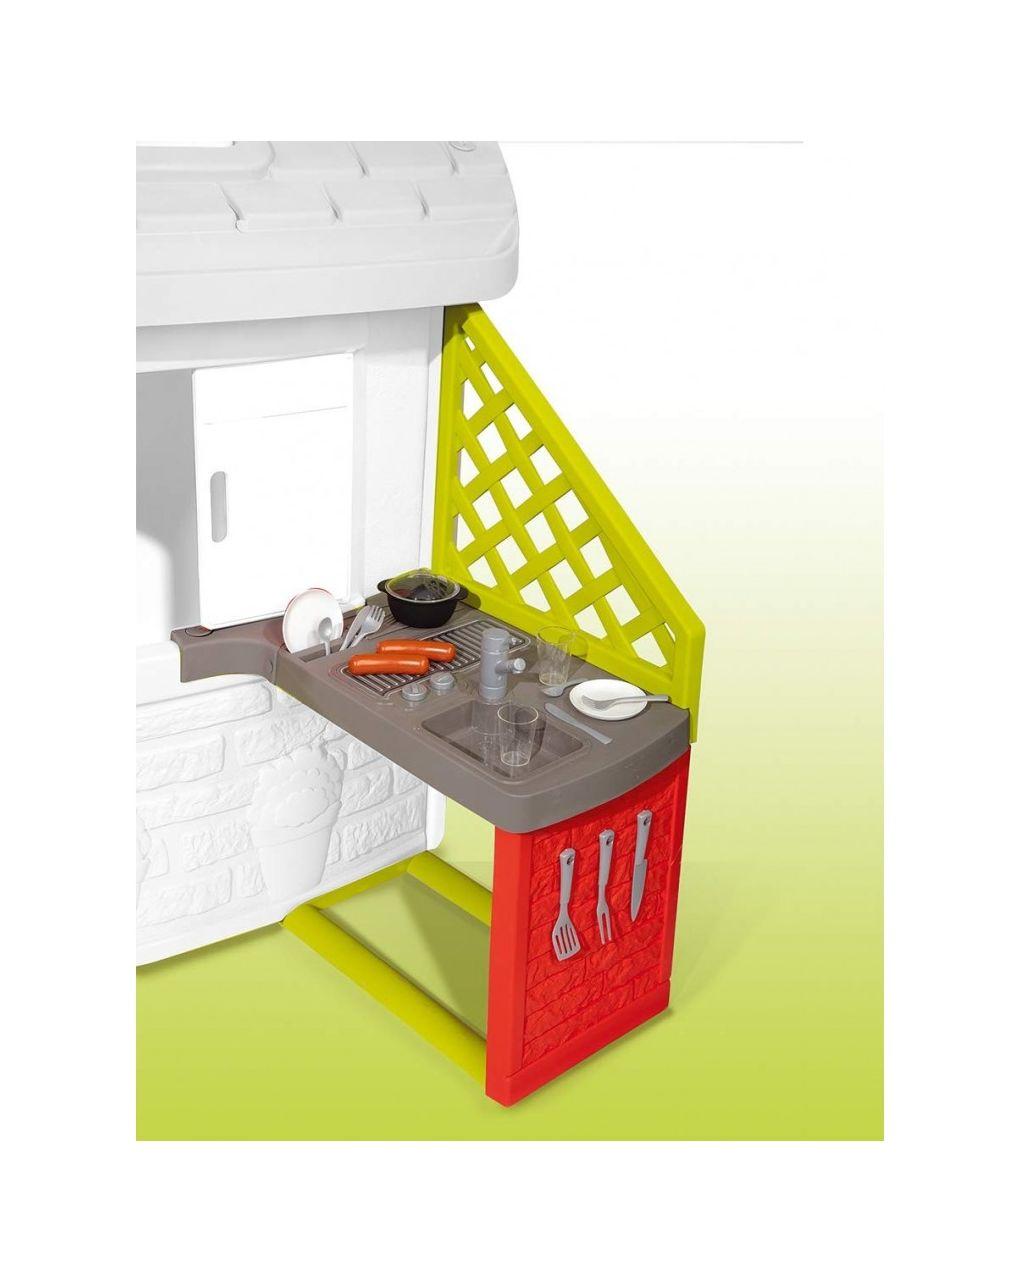 Jura lodge cucina - Smoby